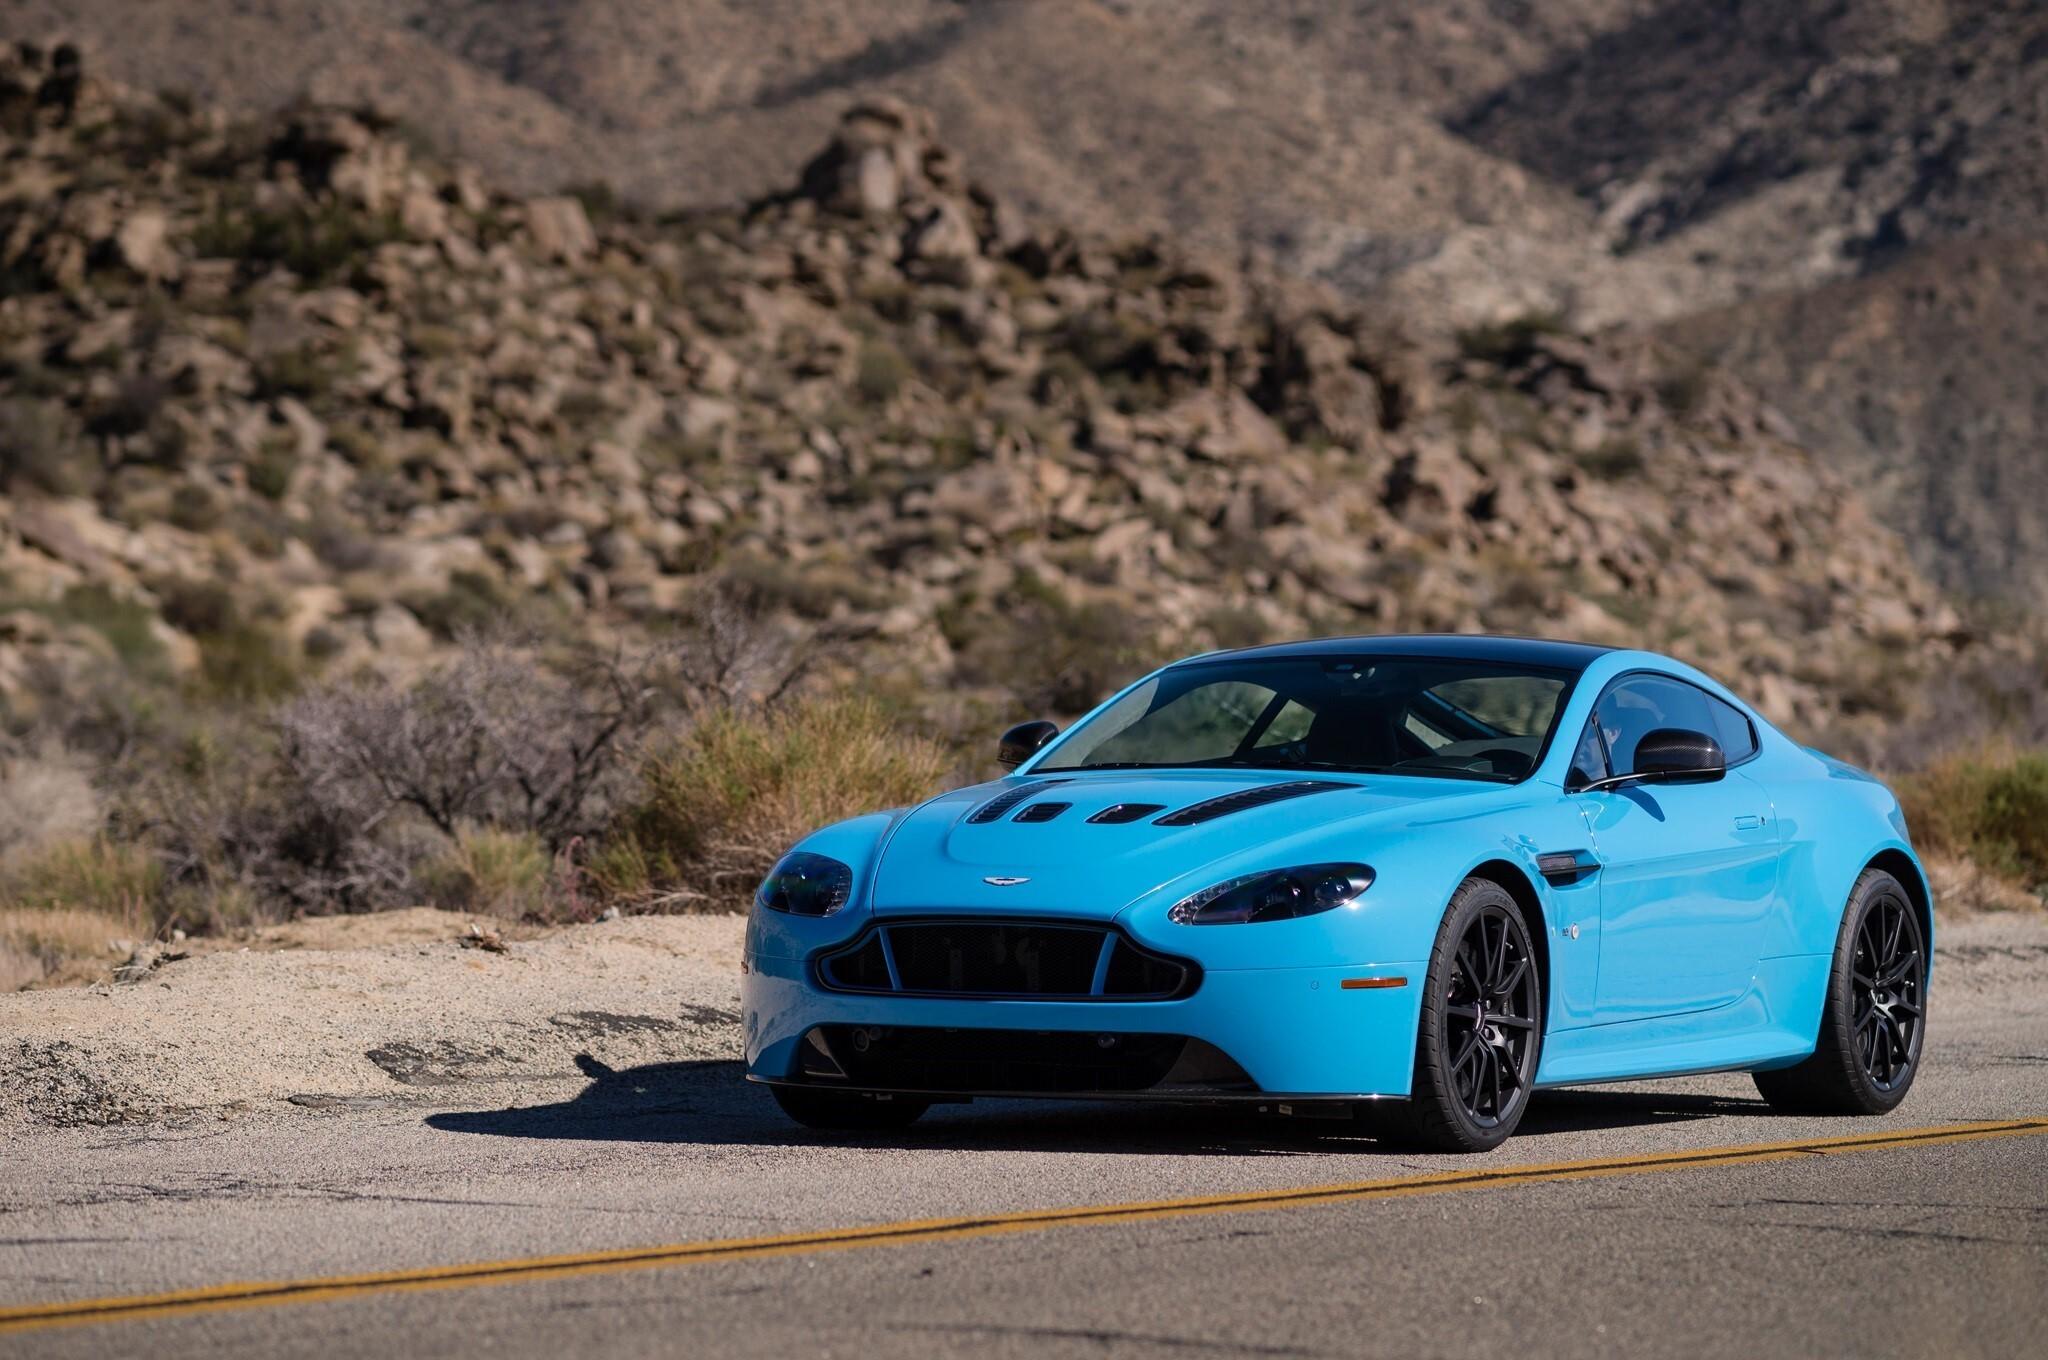 2015 Blue Aston Martin V12 Vantage S Front Cars Nice Photos